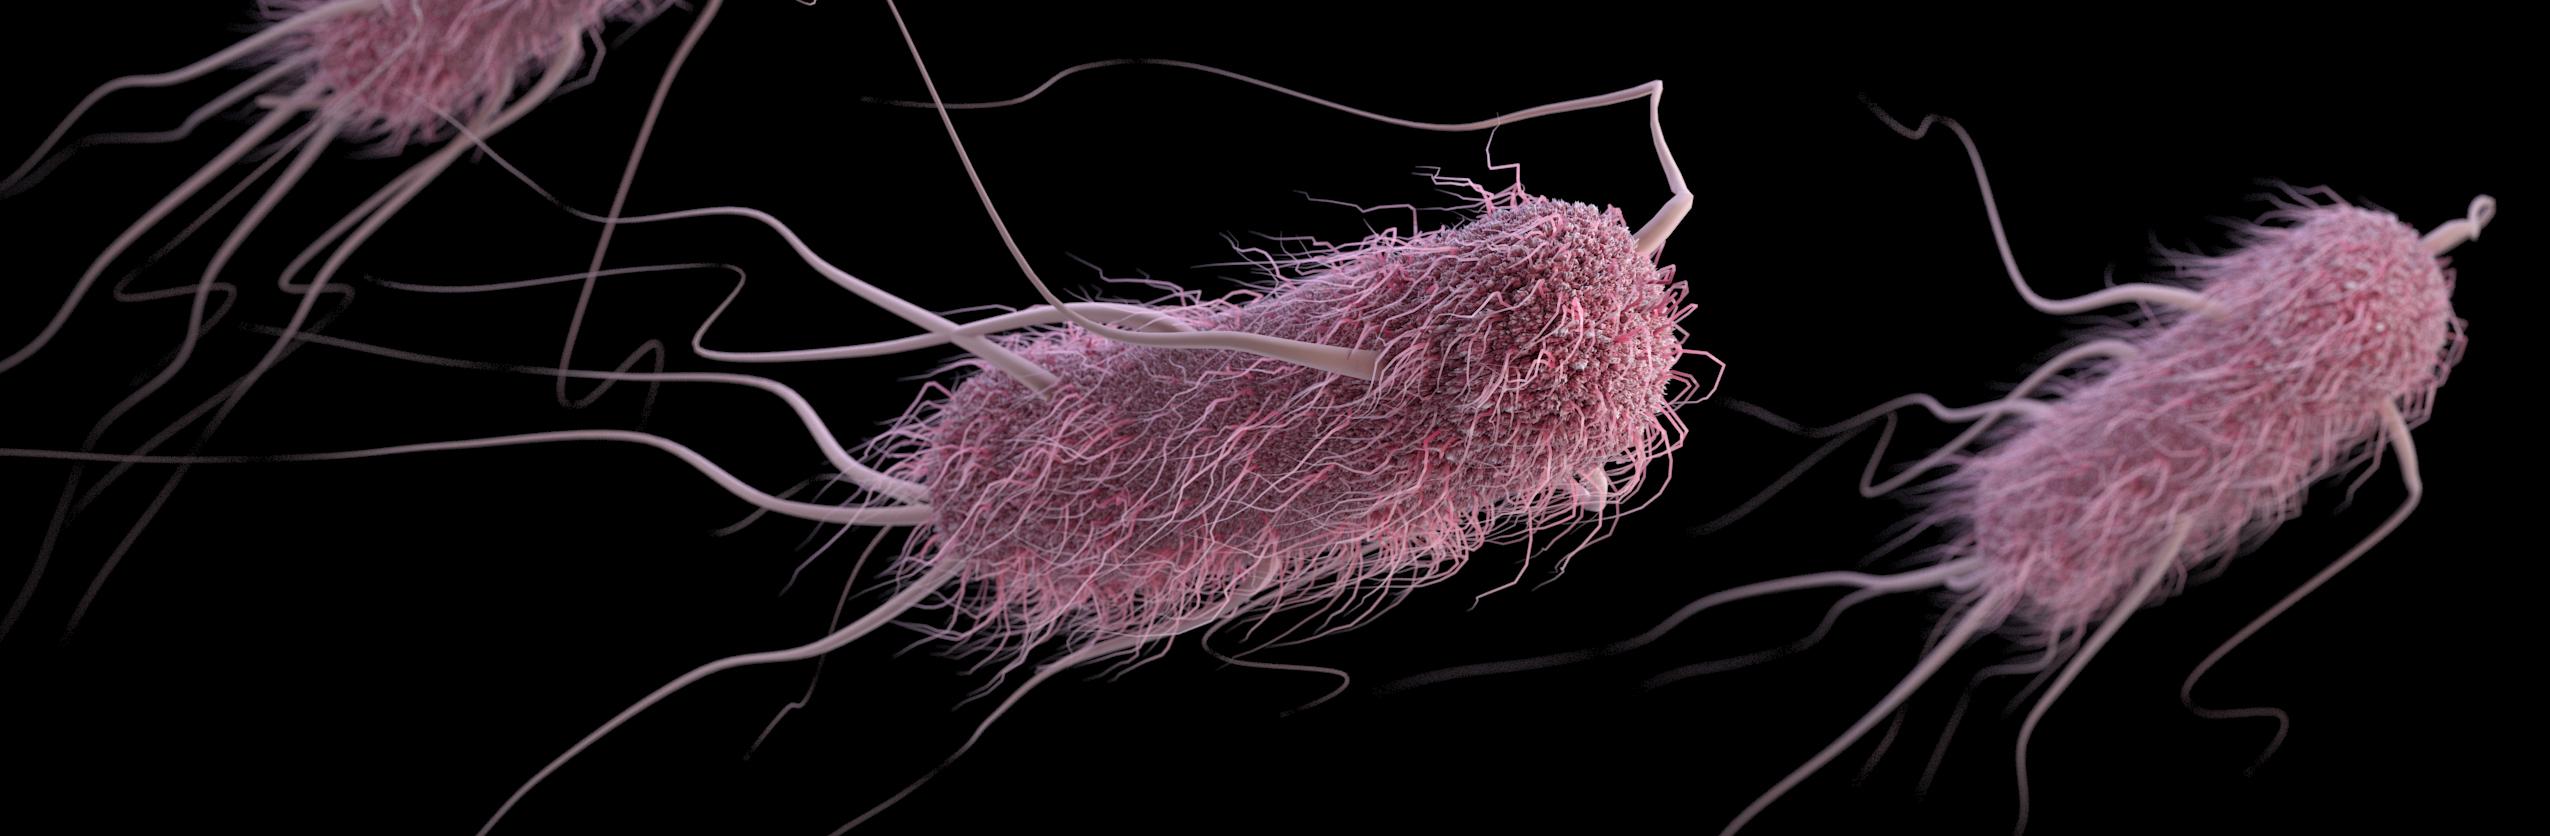 A 3D computer-generated image of Escherichia coli bacteria. / Credit: CDC/ James Archer